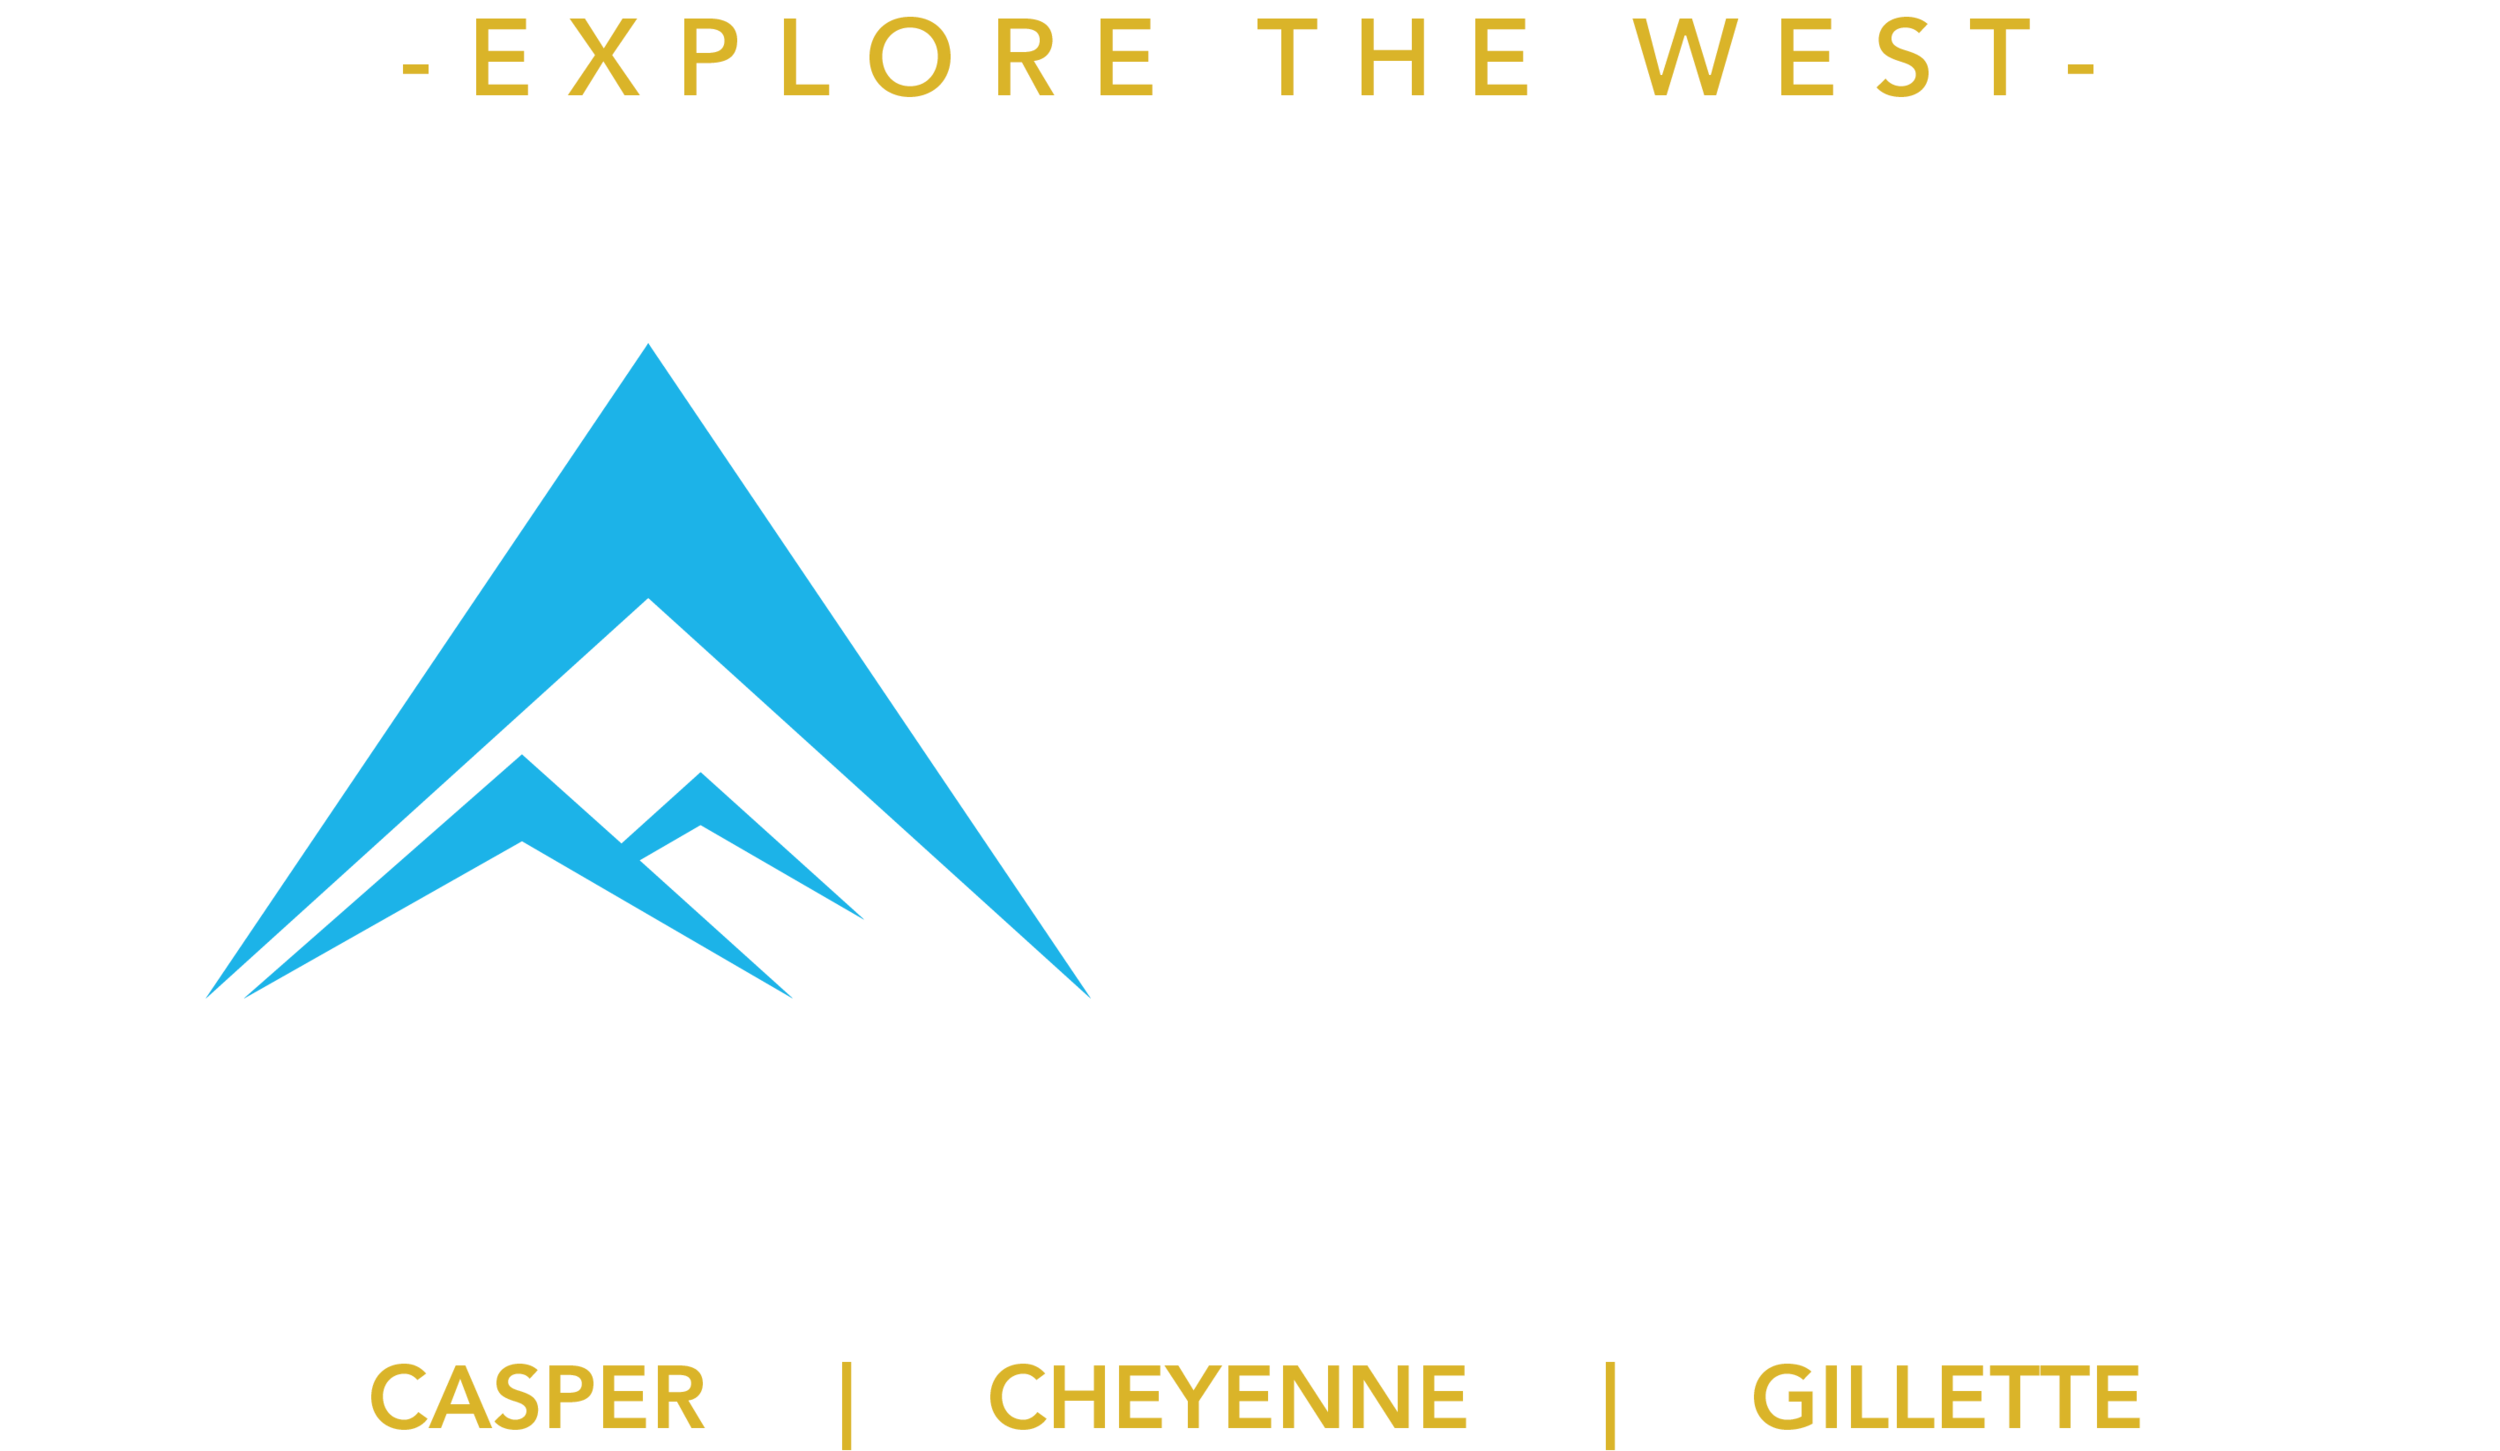 Pacer Energy Banner - BG2.png